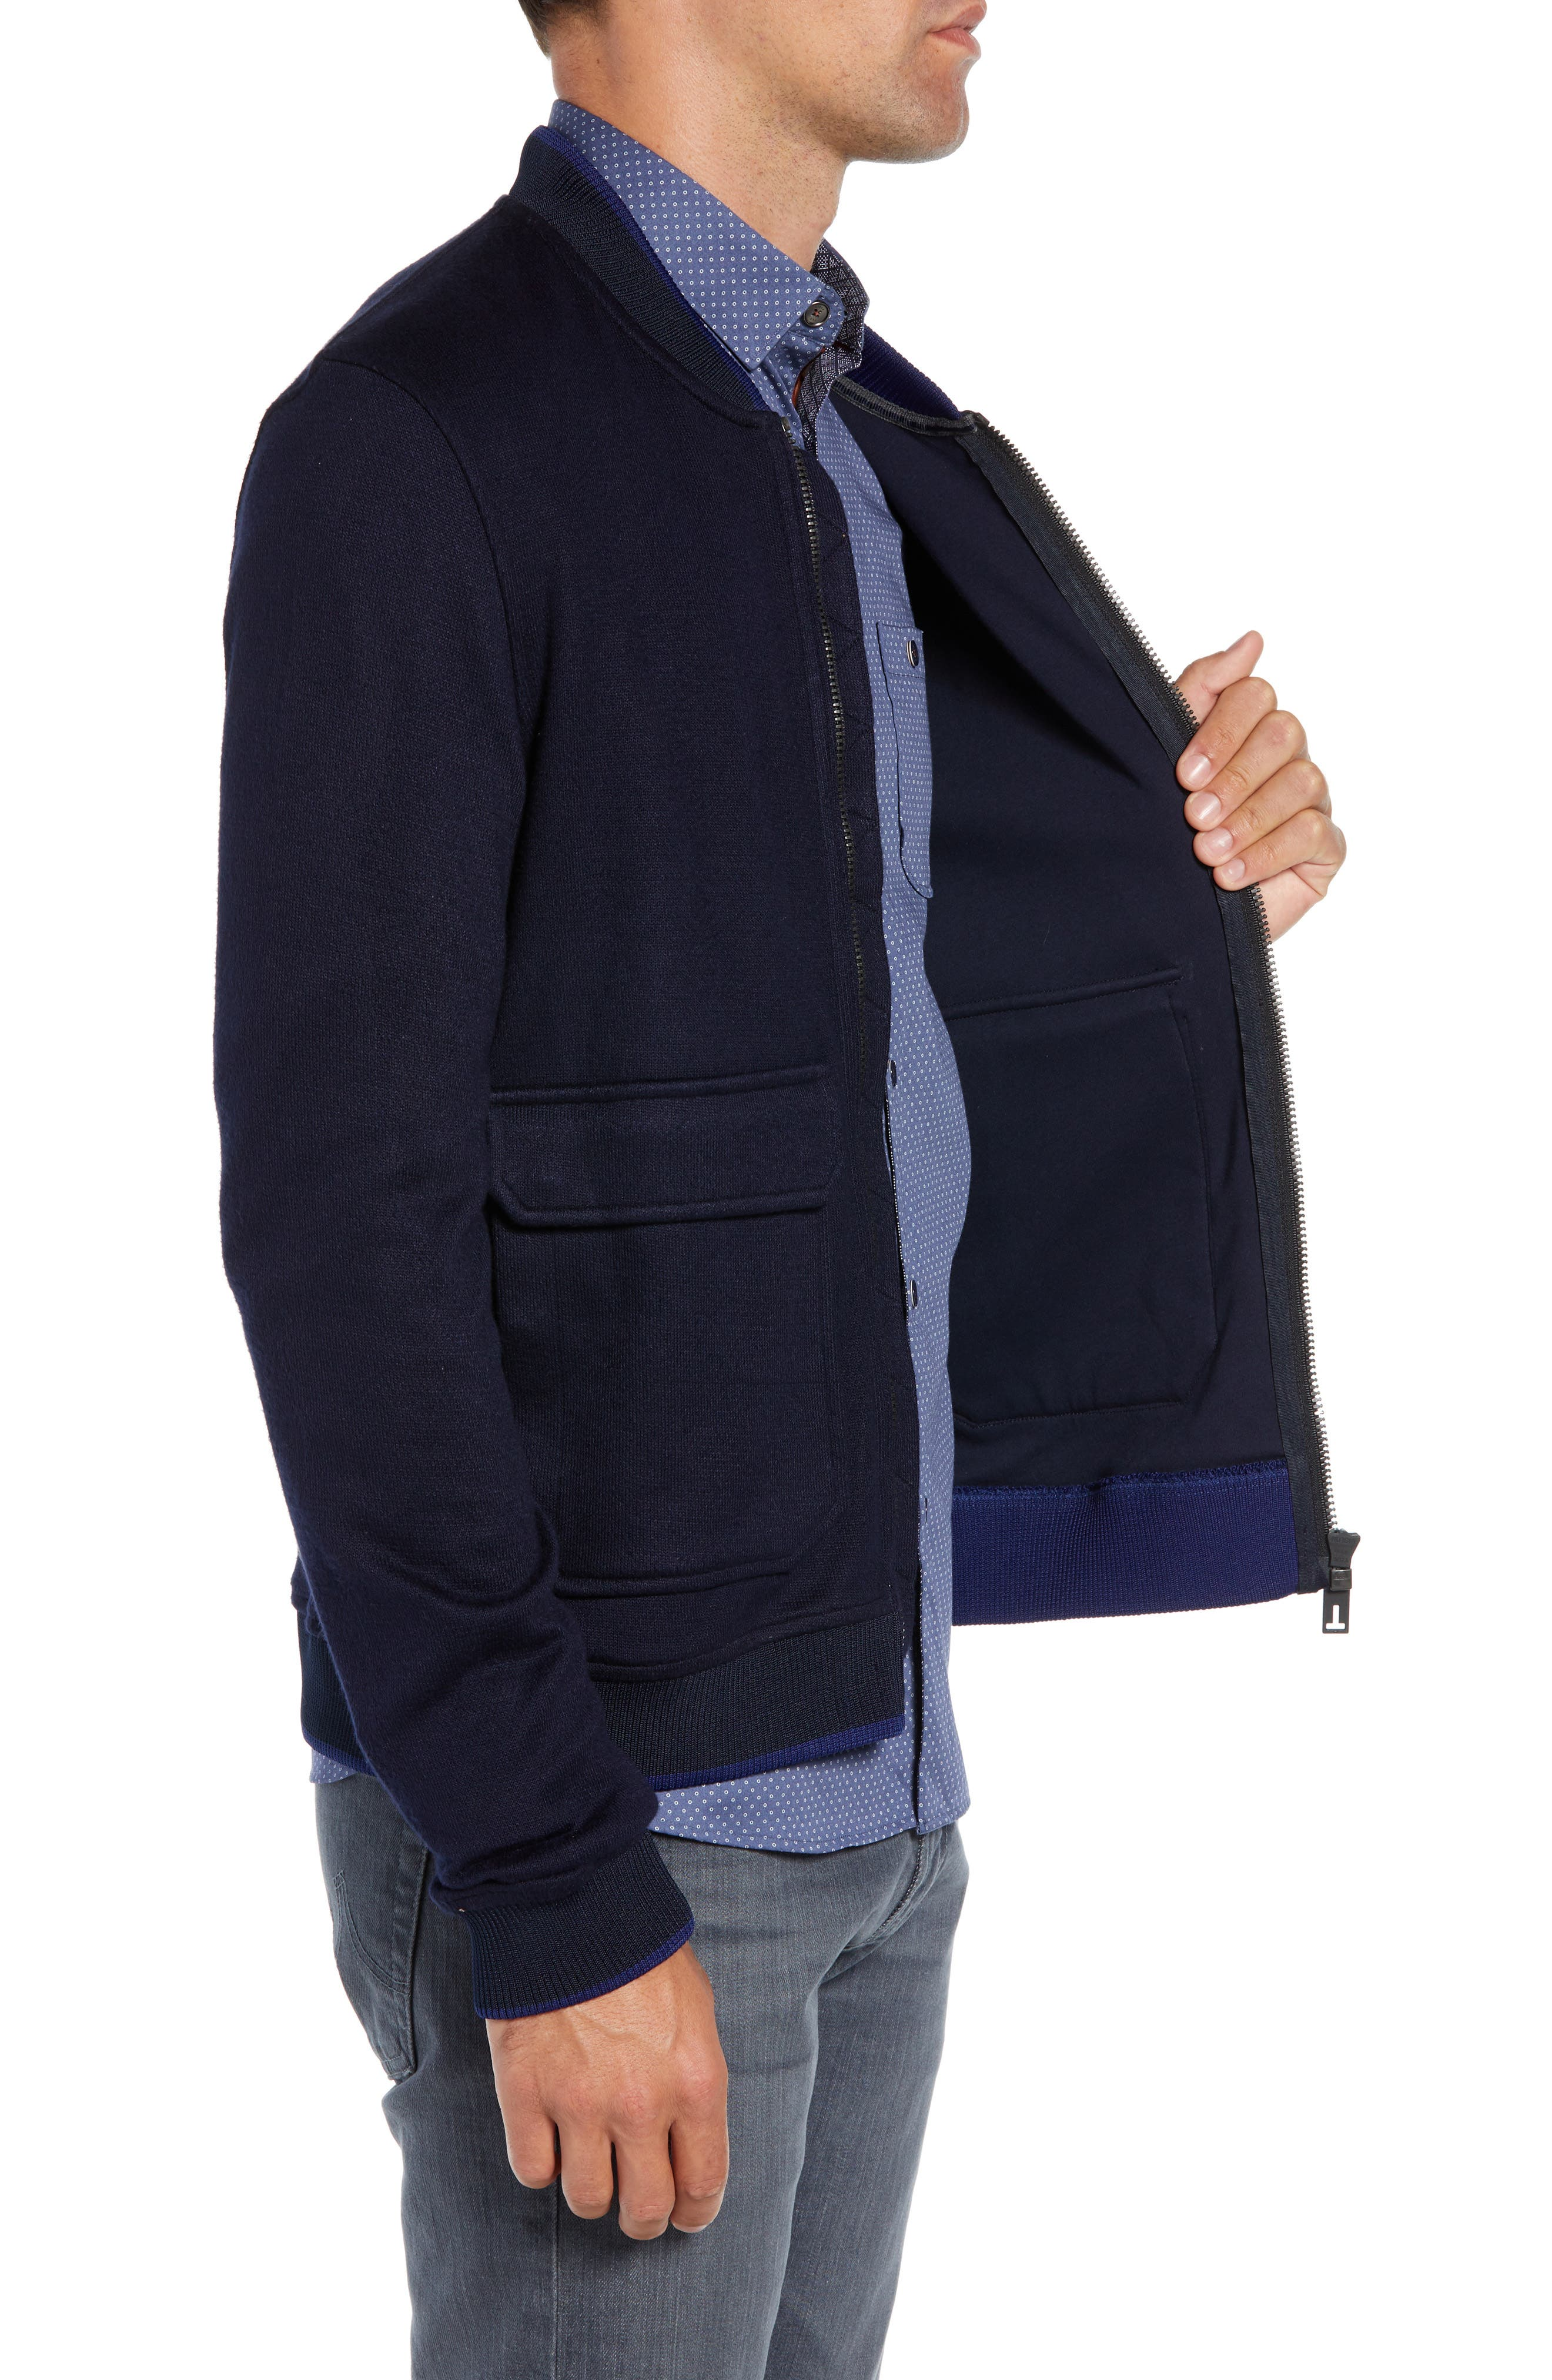 TED BAKER LONDON,                             Cadbir Trim Fit Jersey Bomber Jacket,                             Alternate thumbnail 3, color,                             410